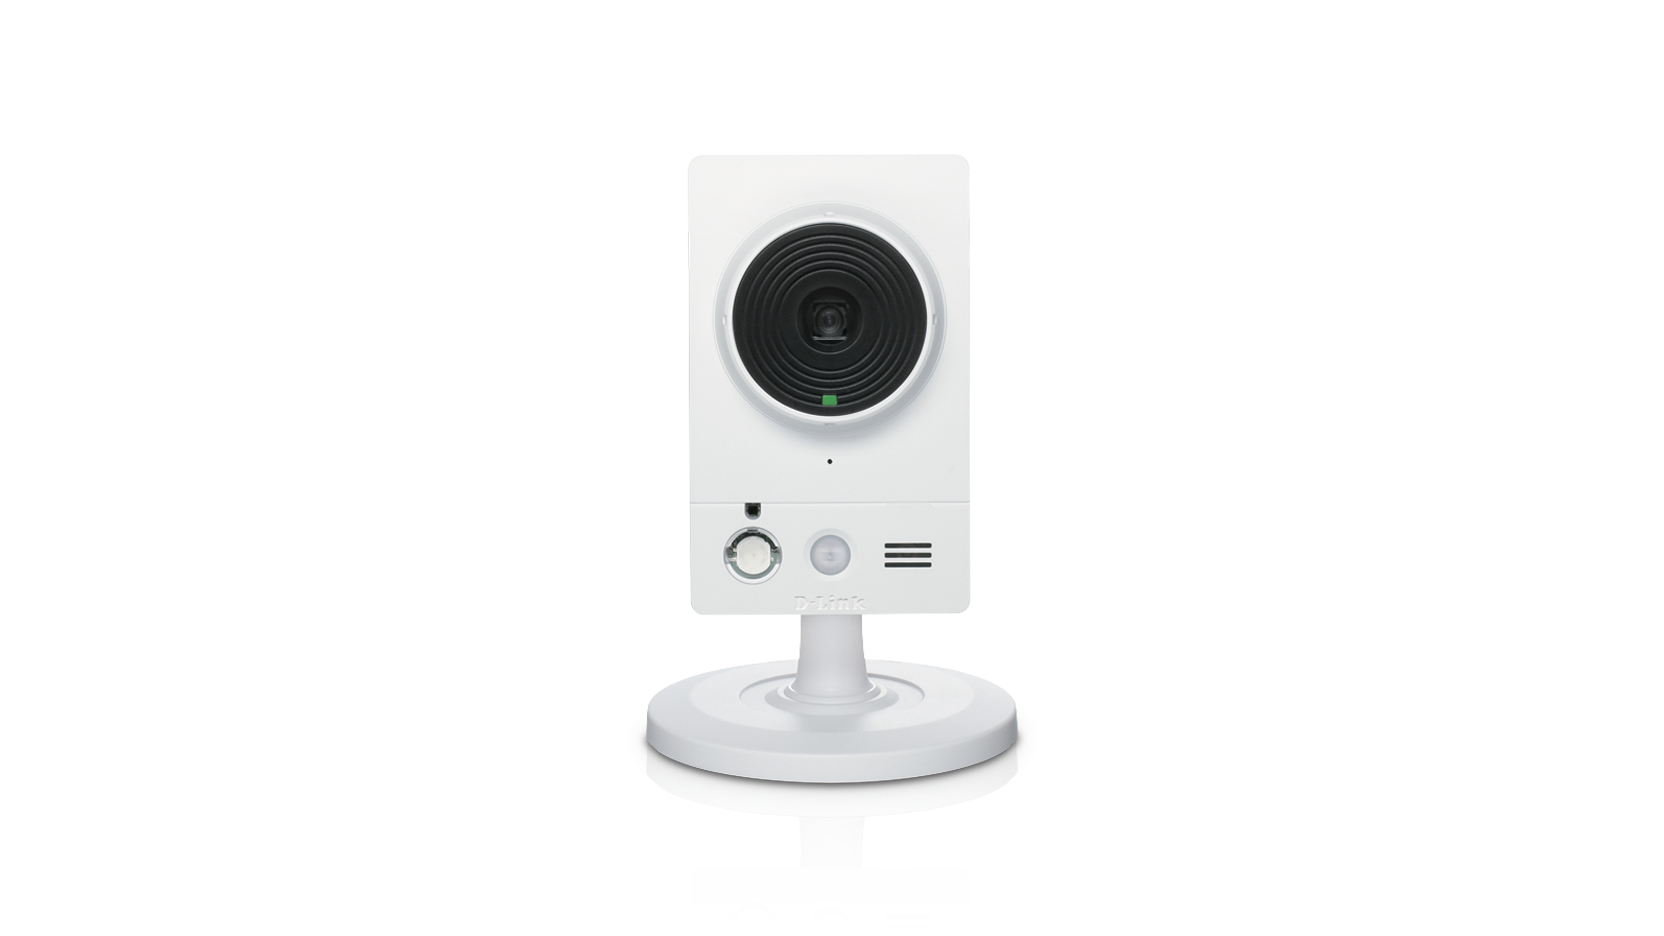 D-Link DCS-2230L IP Cube White surveillance camera